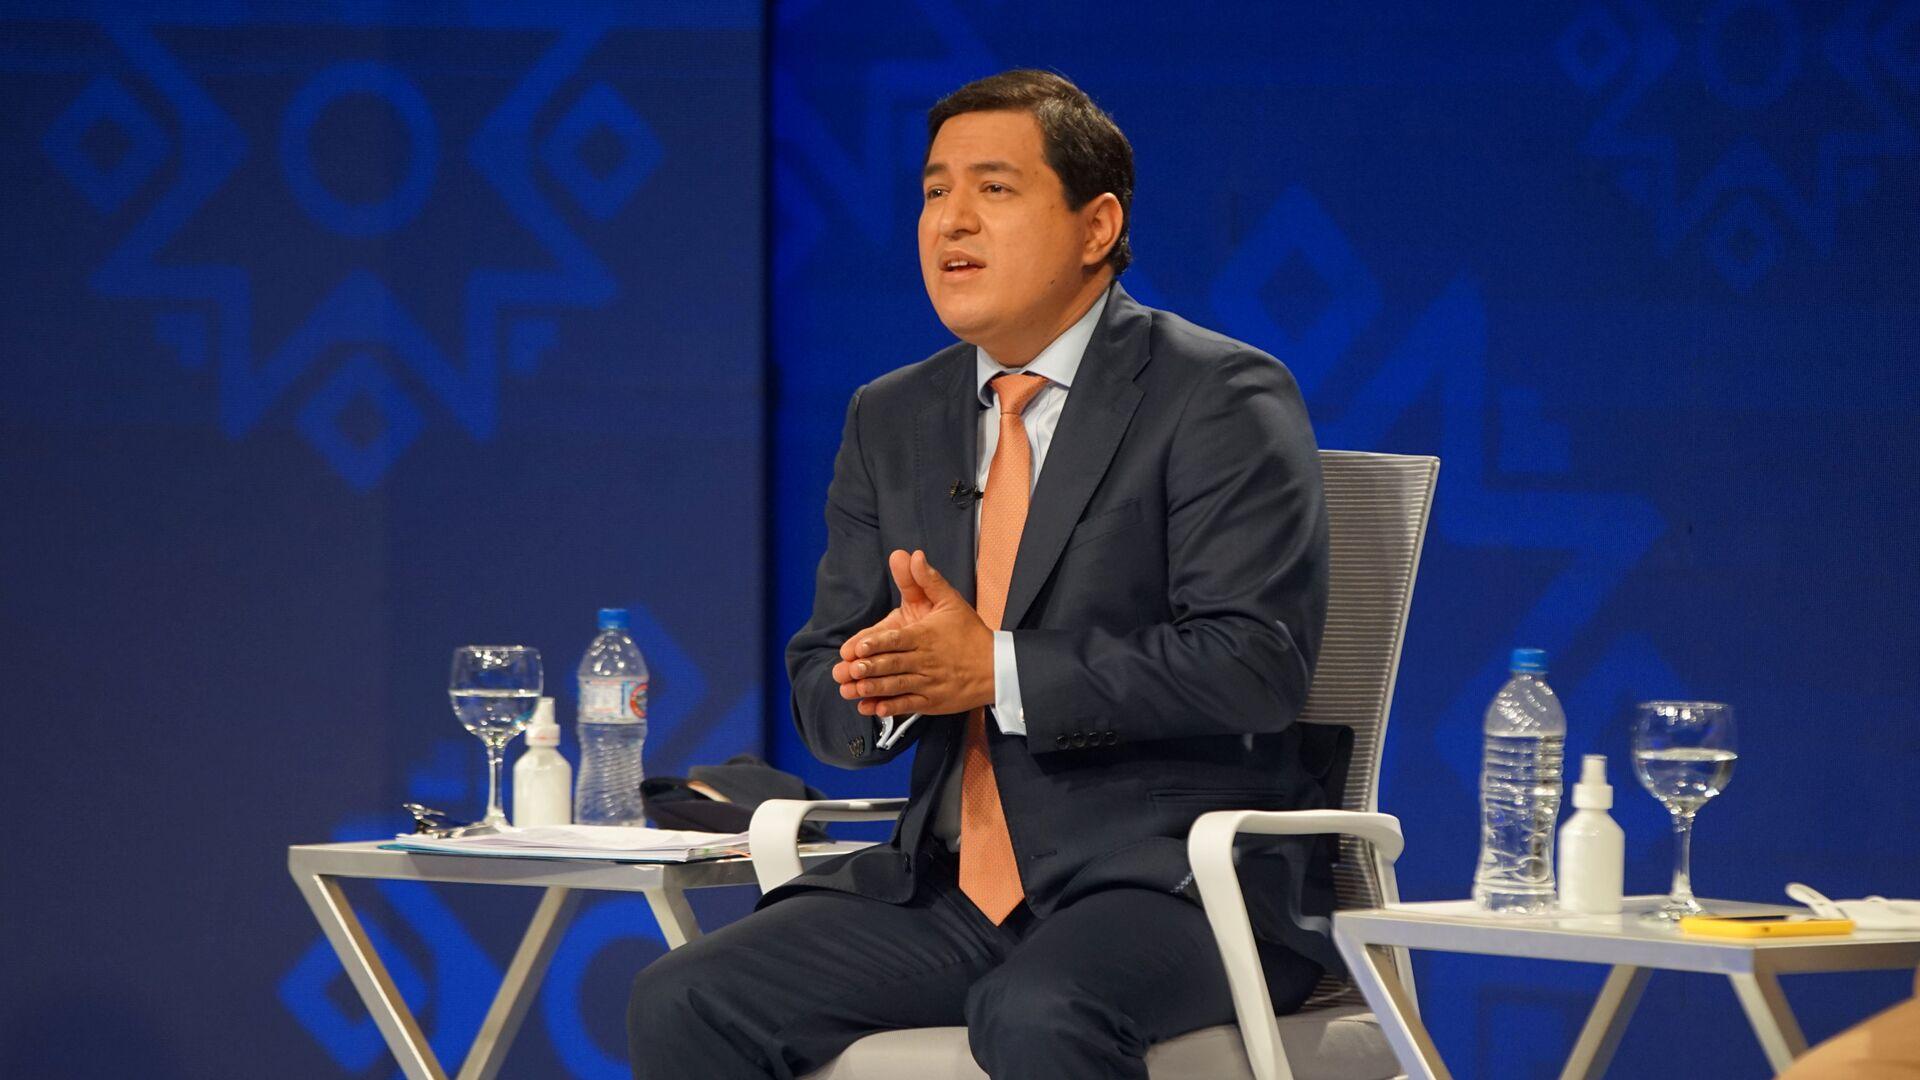 Andrés Arauz, el candidato a presidente de Ecuador - Sputnik Mundo, 1920, 03.02.2021